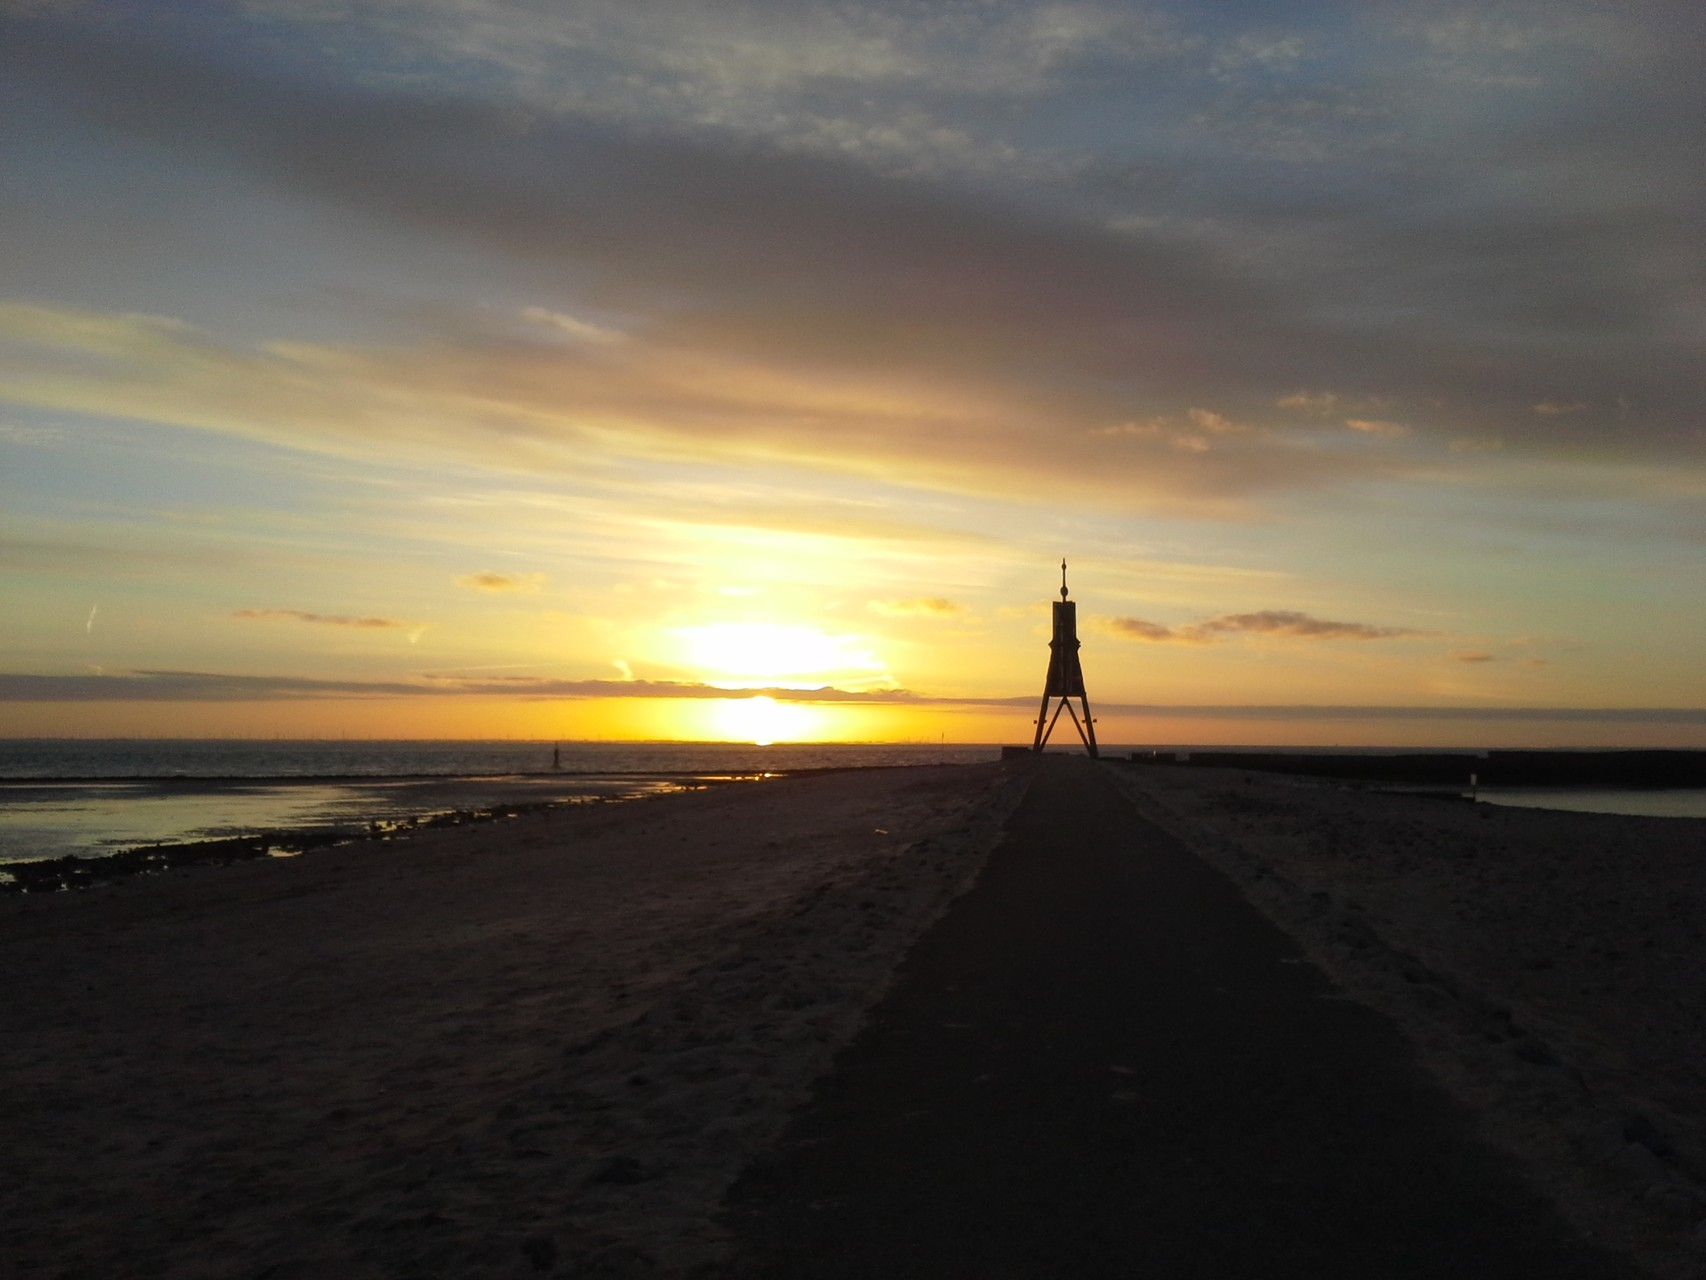 Sonnenaufgang bei der Kugelbake im Juni